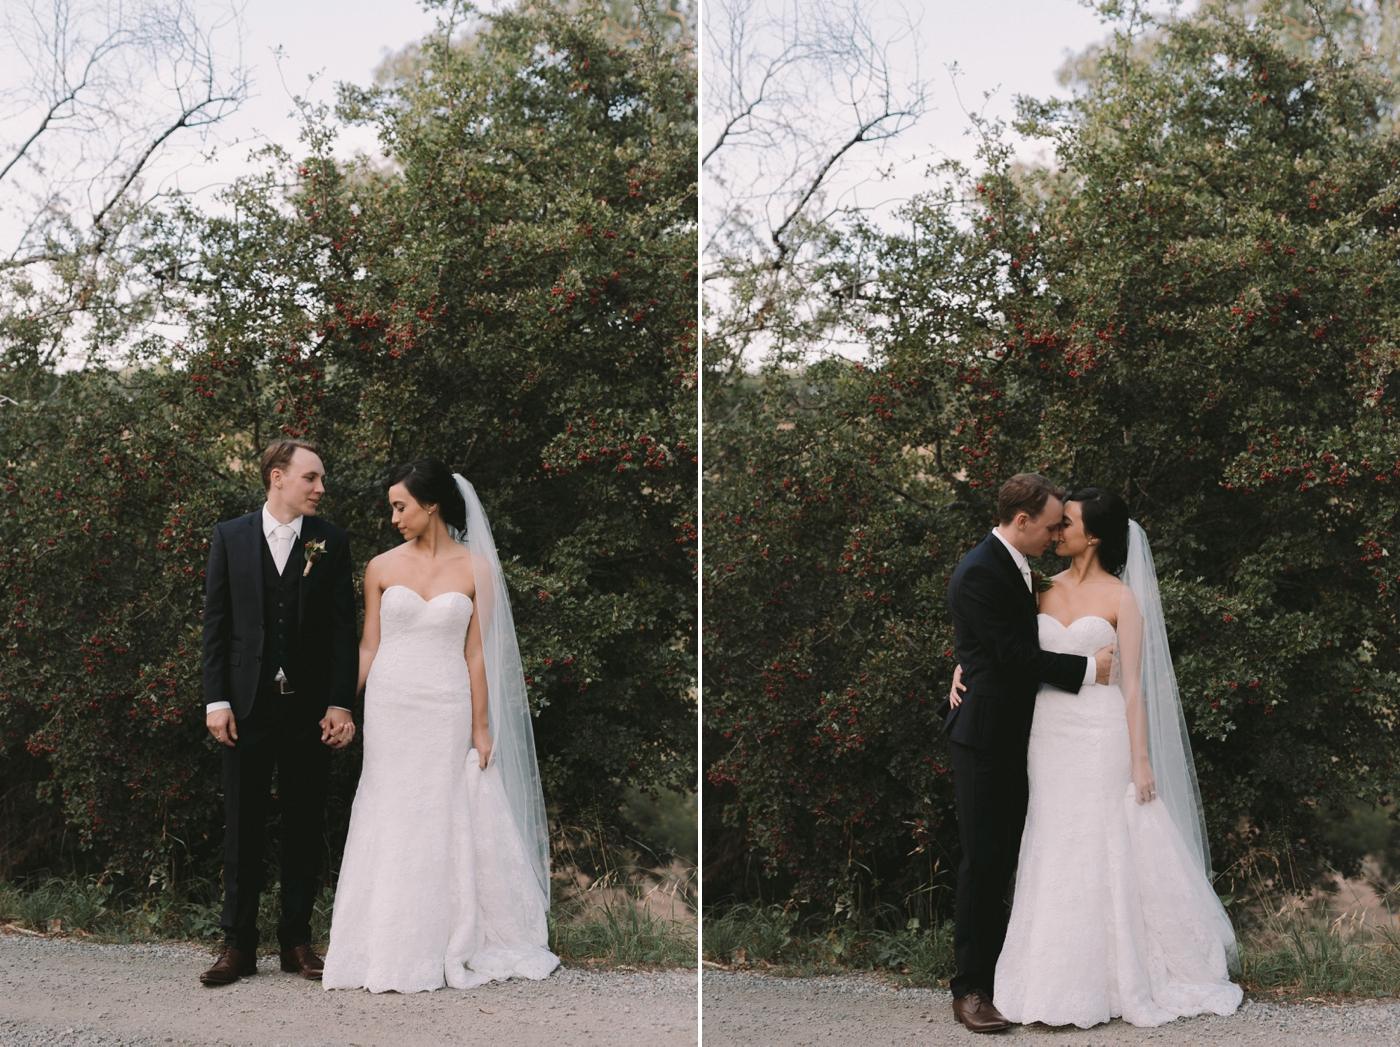 Jasmine and Adam - Natural wedding photographer in Adelaide - Candid Wedding Photographer Adelaide - www.katherineschultzphotography.com 34